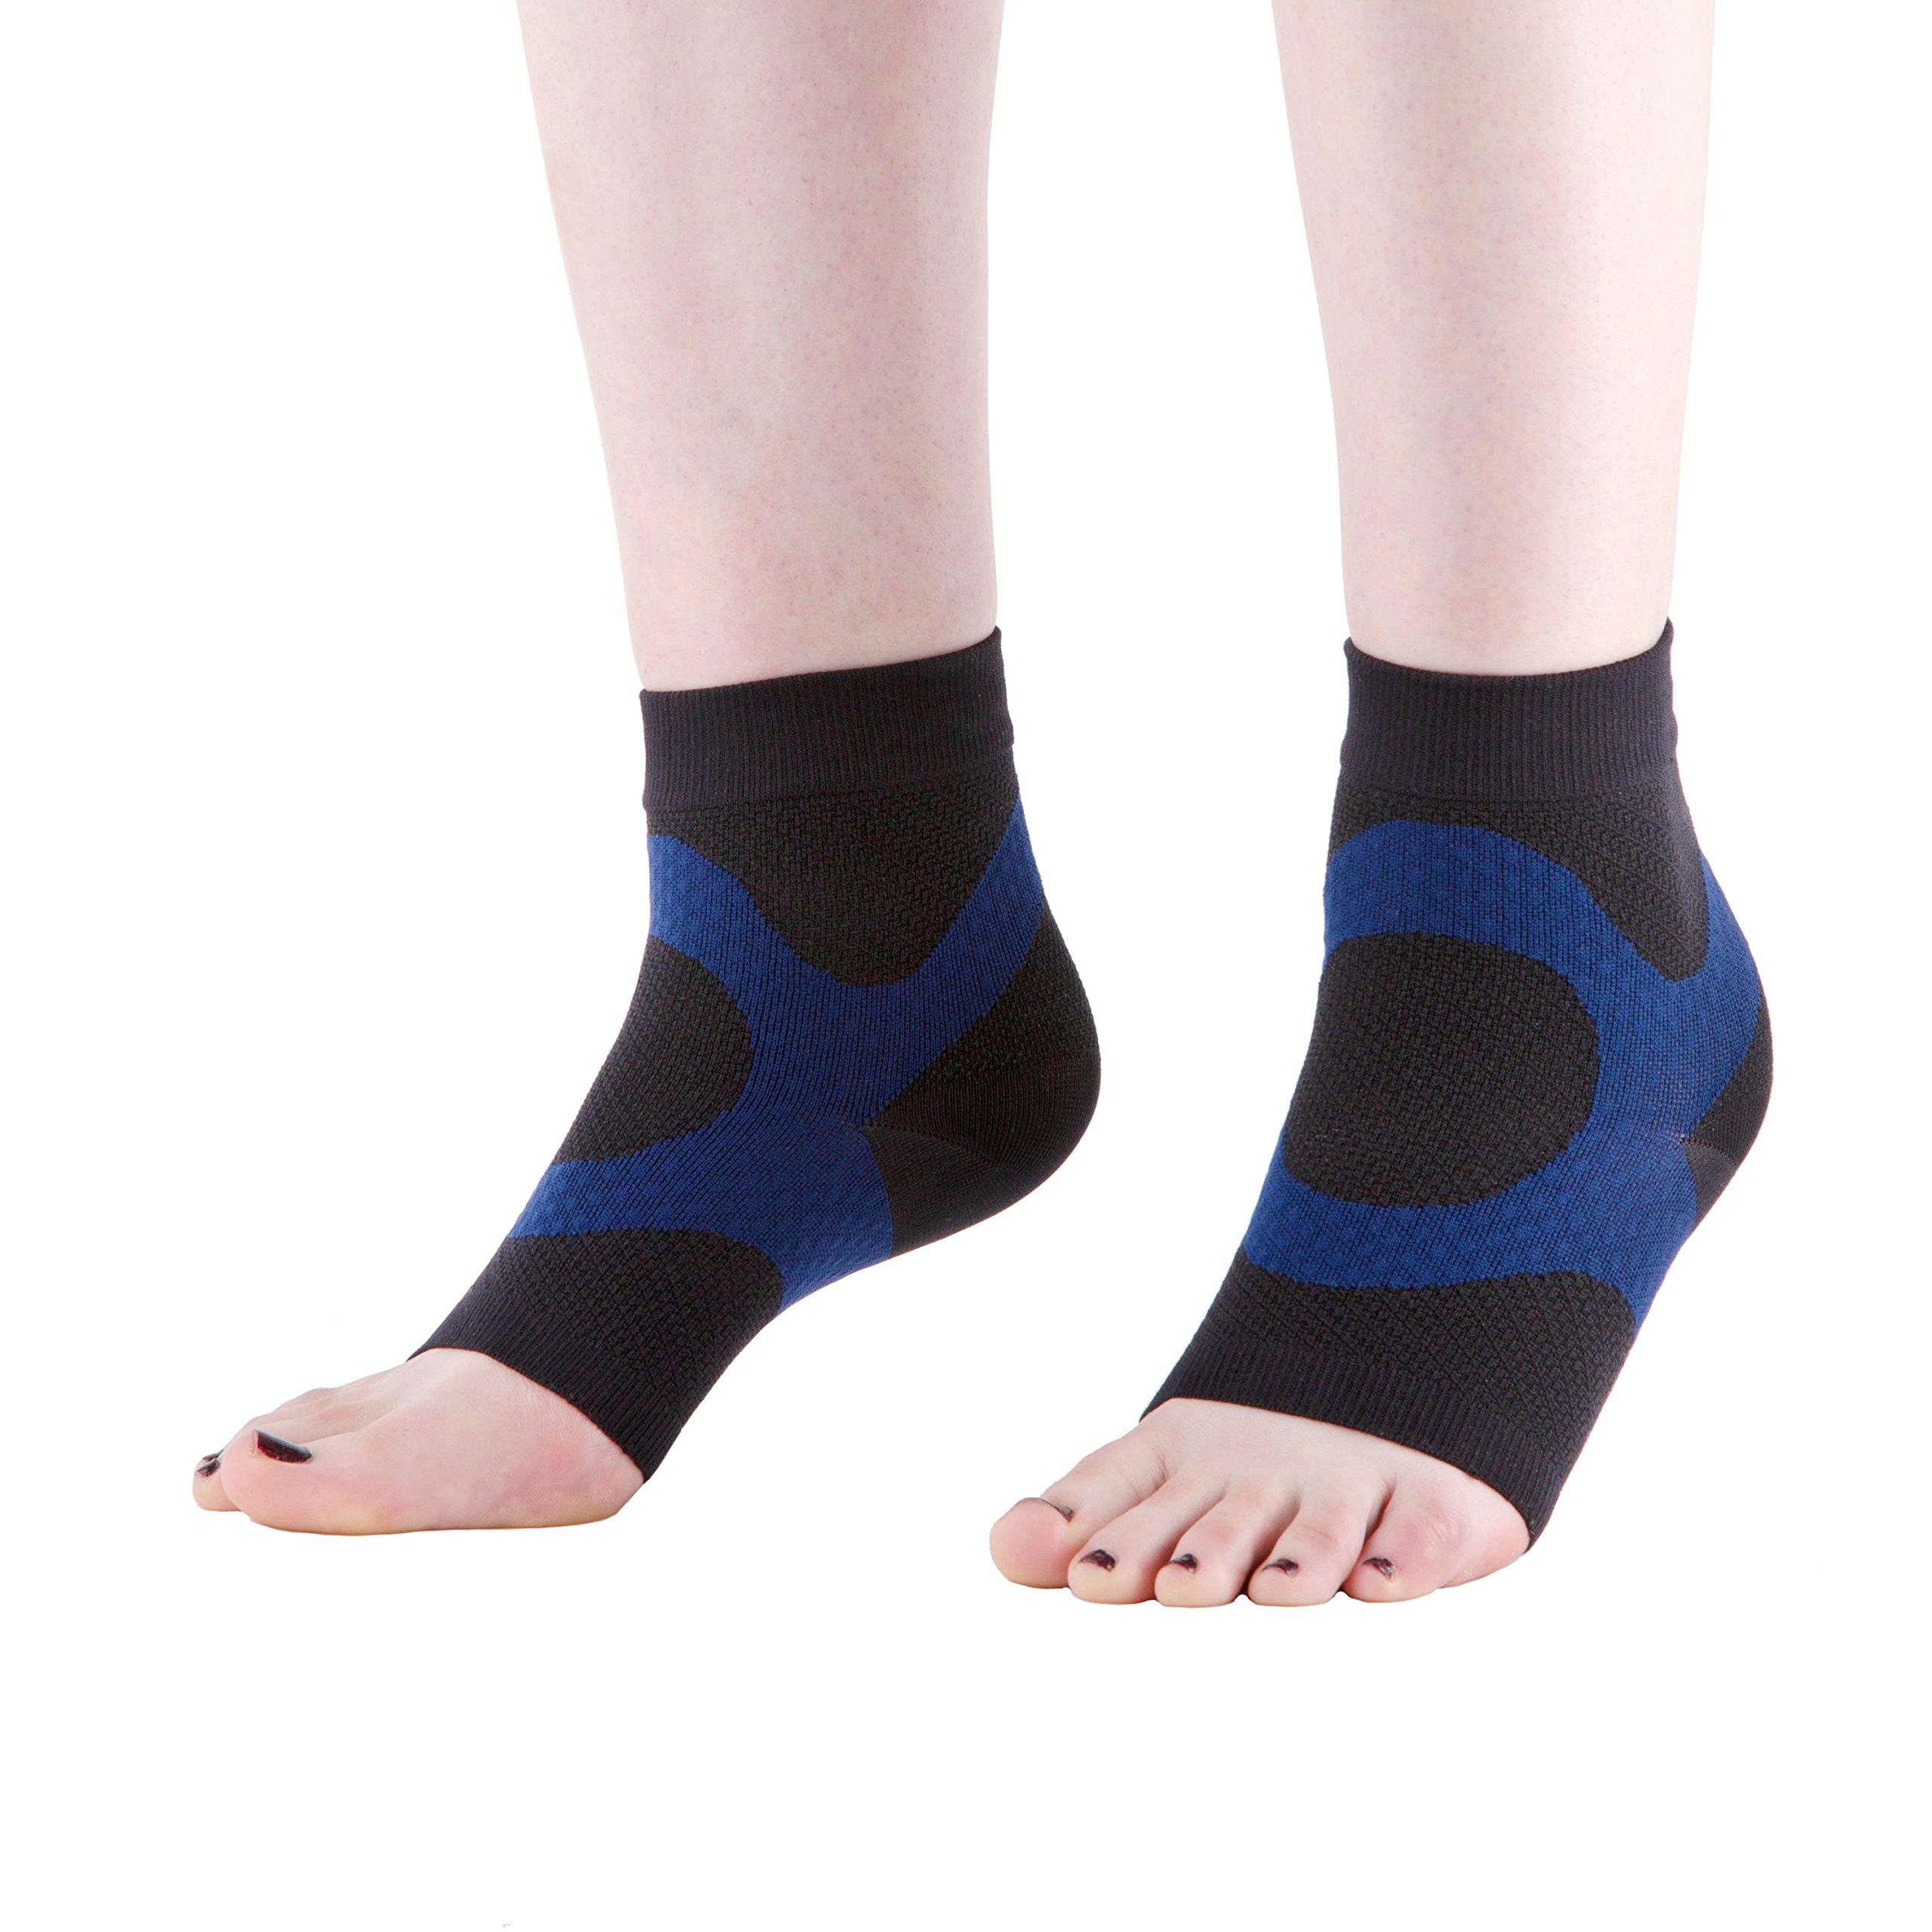 Wanderlust Plantar Fasciitis Sleeves - Open Toe Compression Socks With KT Tape (LARGE)